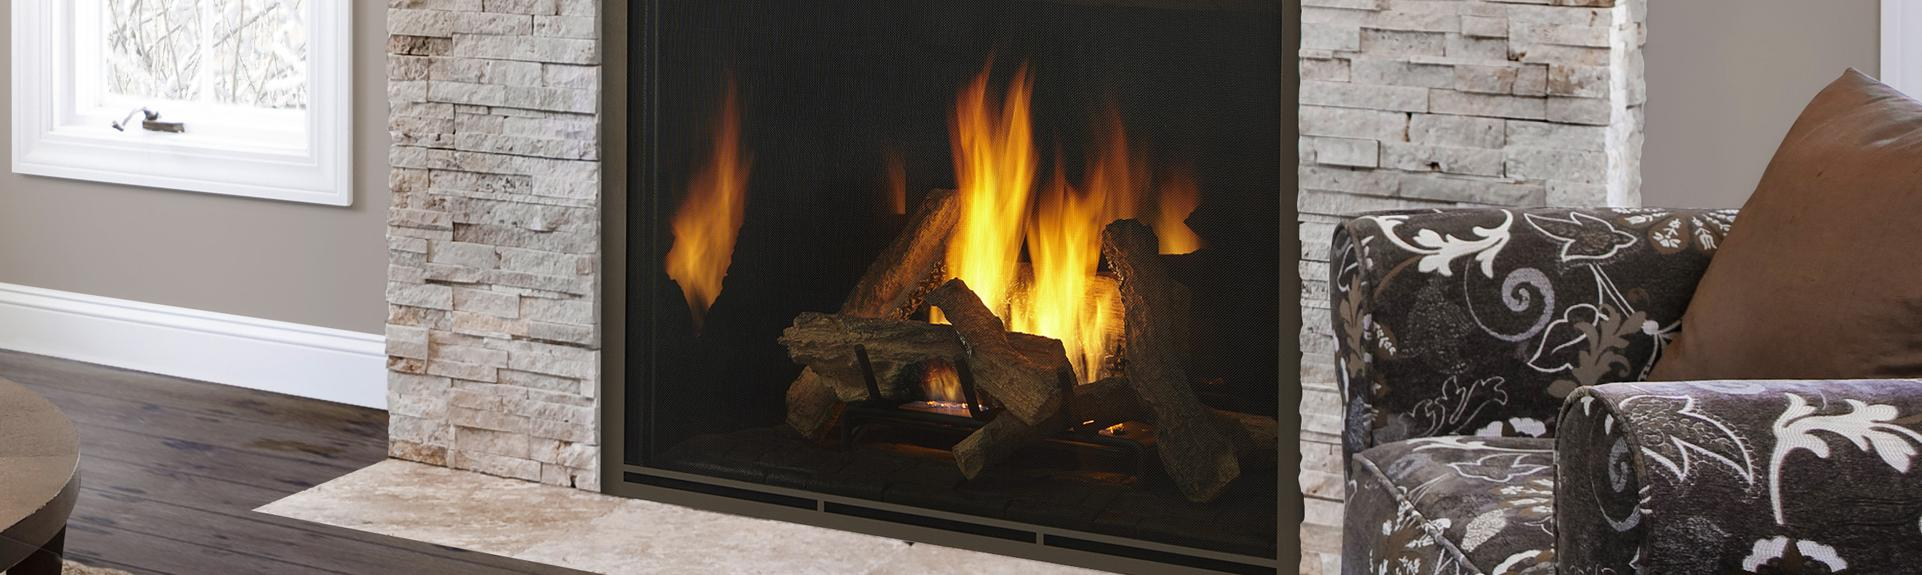 wood stove fireplace lakewood ocean county nj